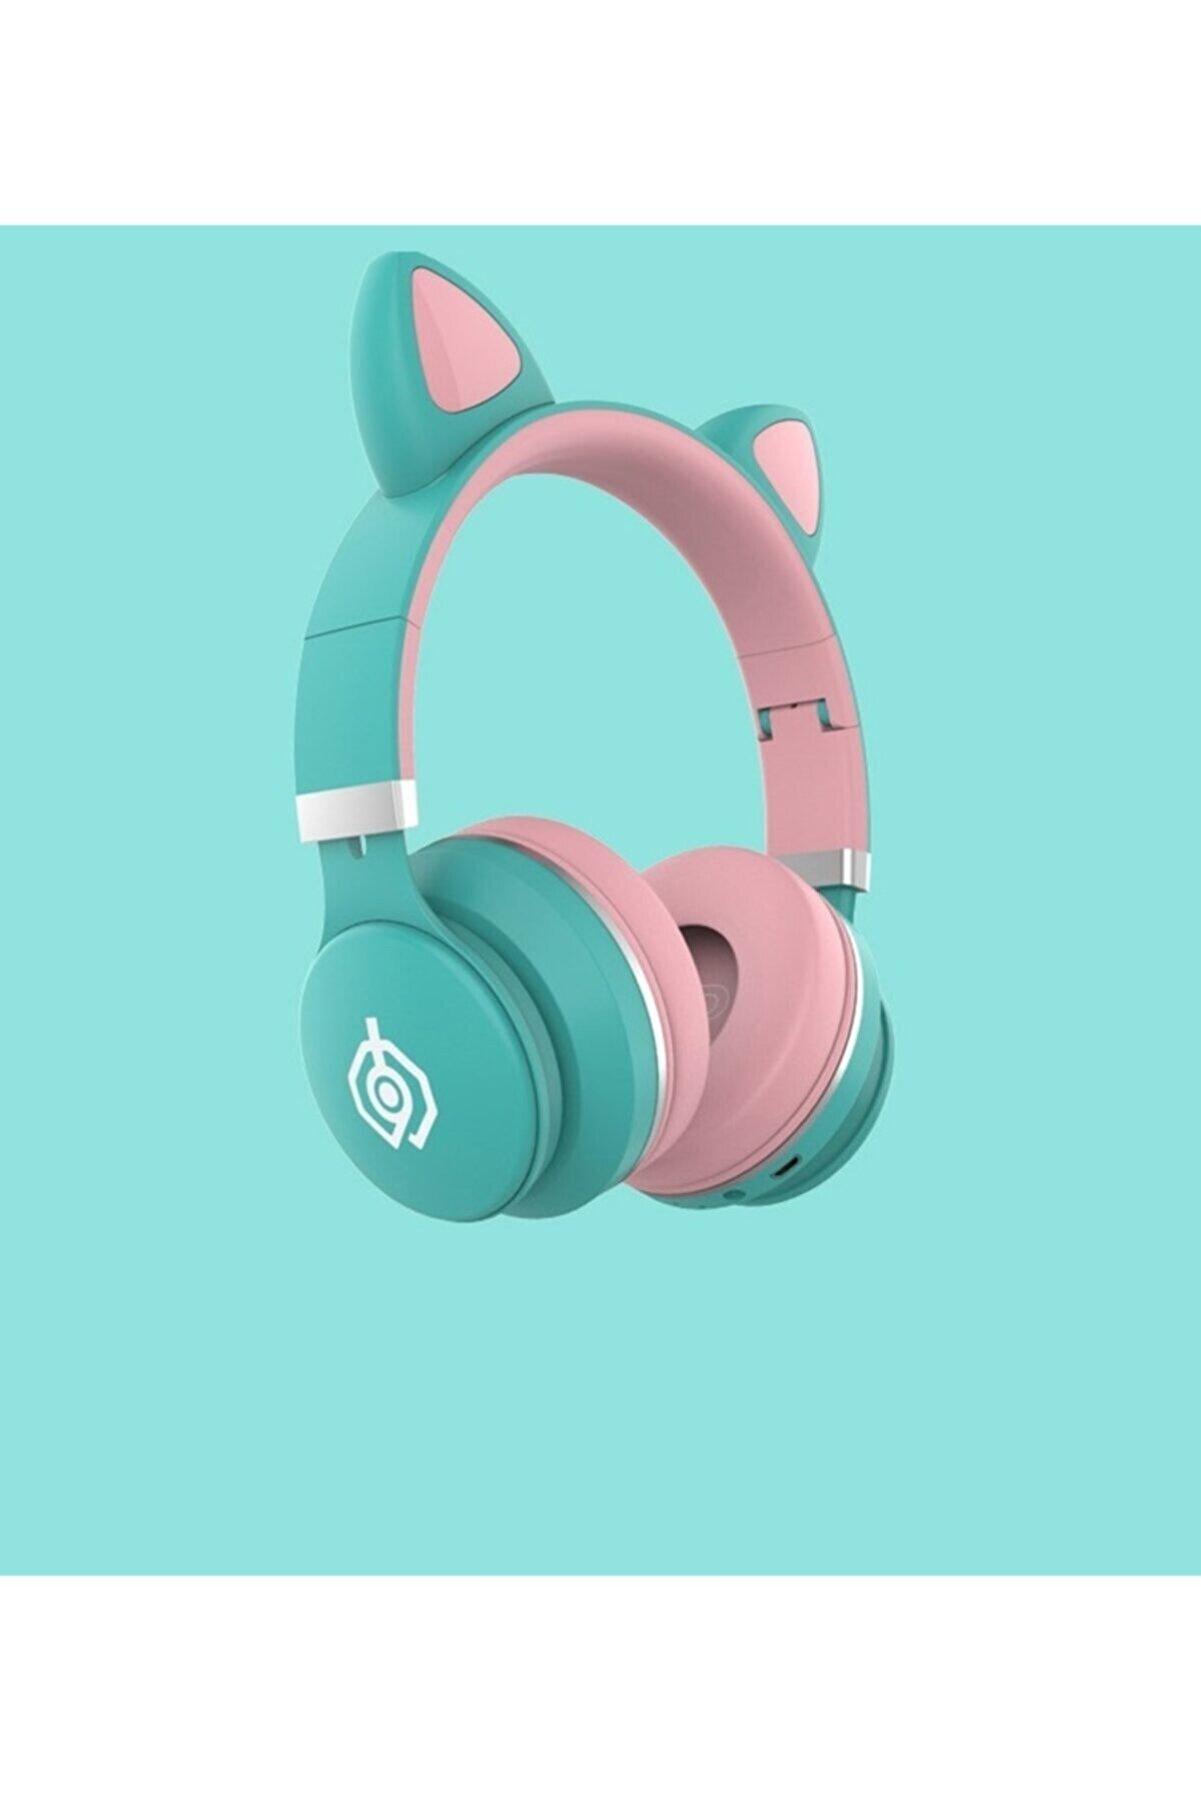 T G Kablosuz Bluetooth 5.0 Stereo Yüksek Ses Akıllı Renkli LED Kulaklık